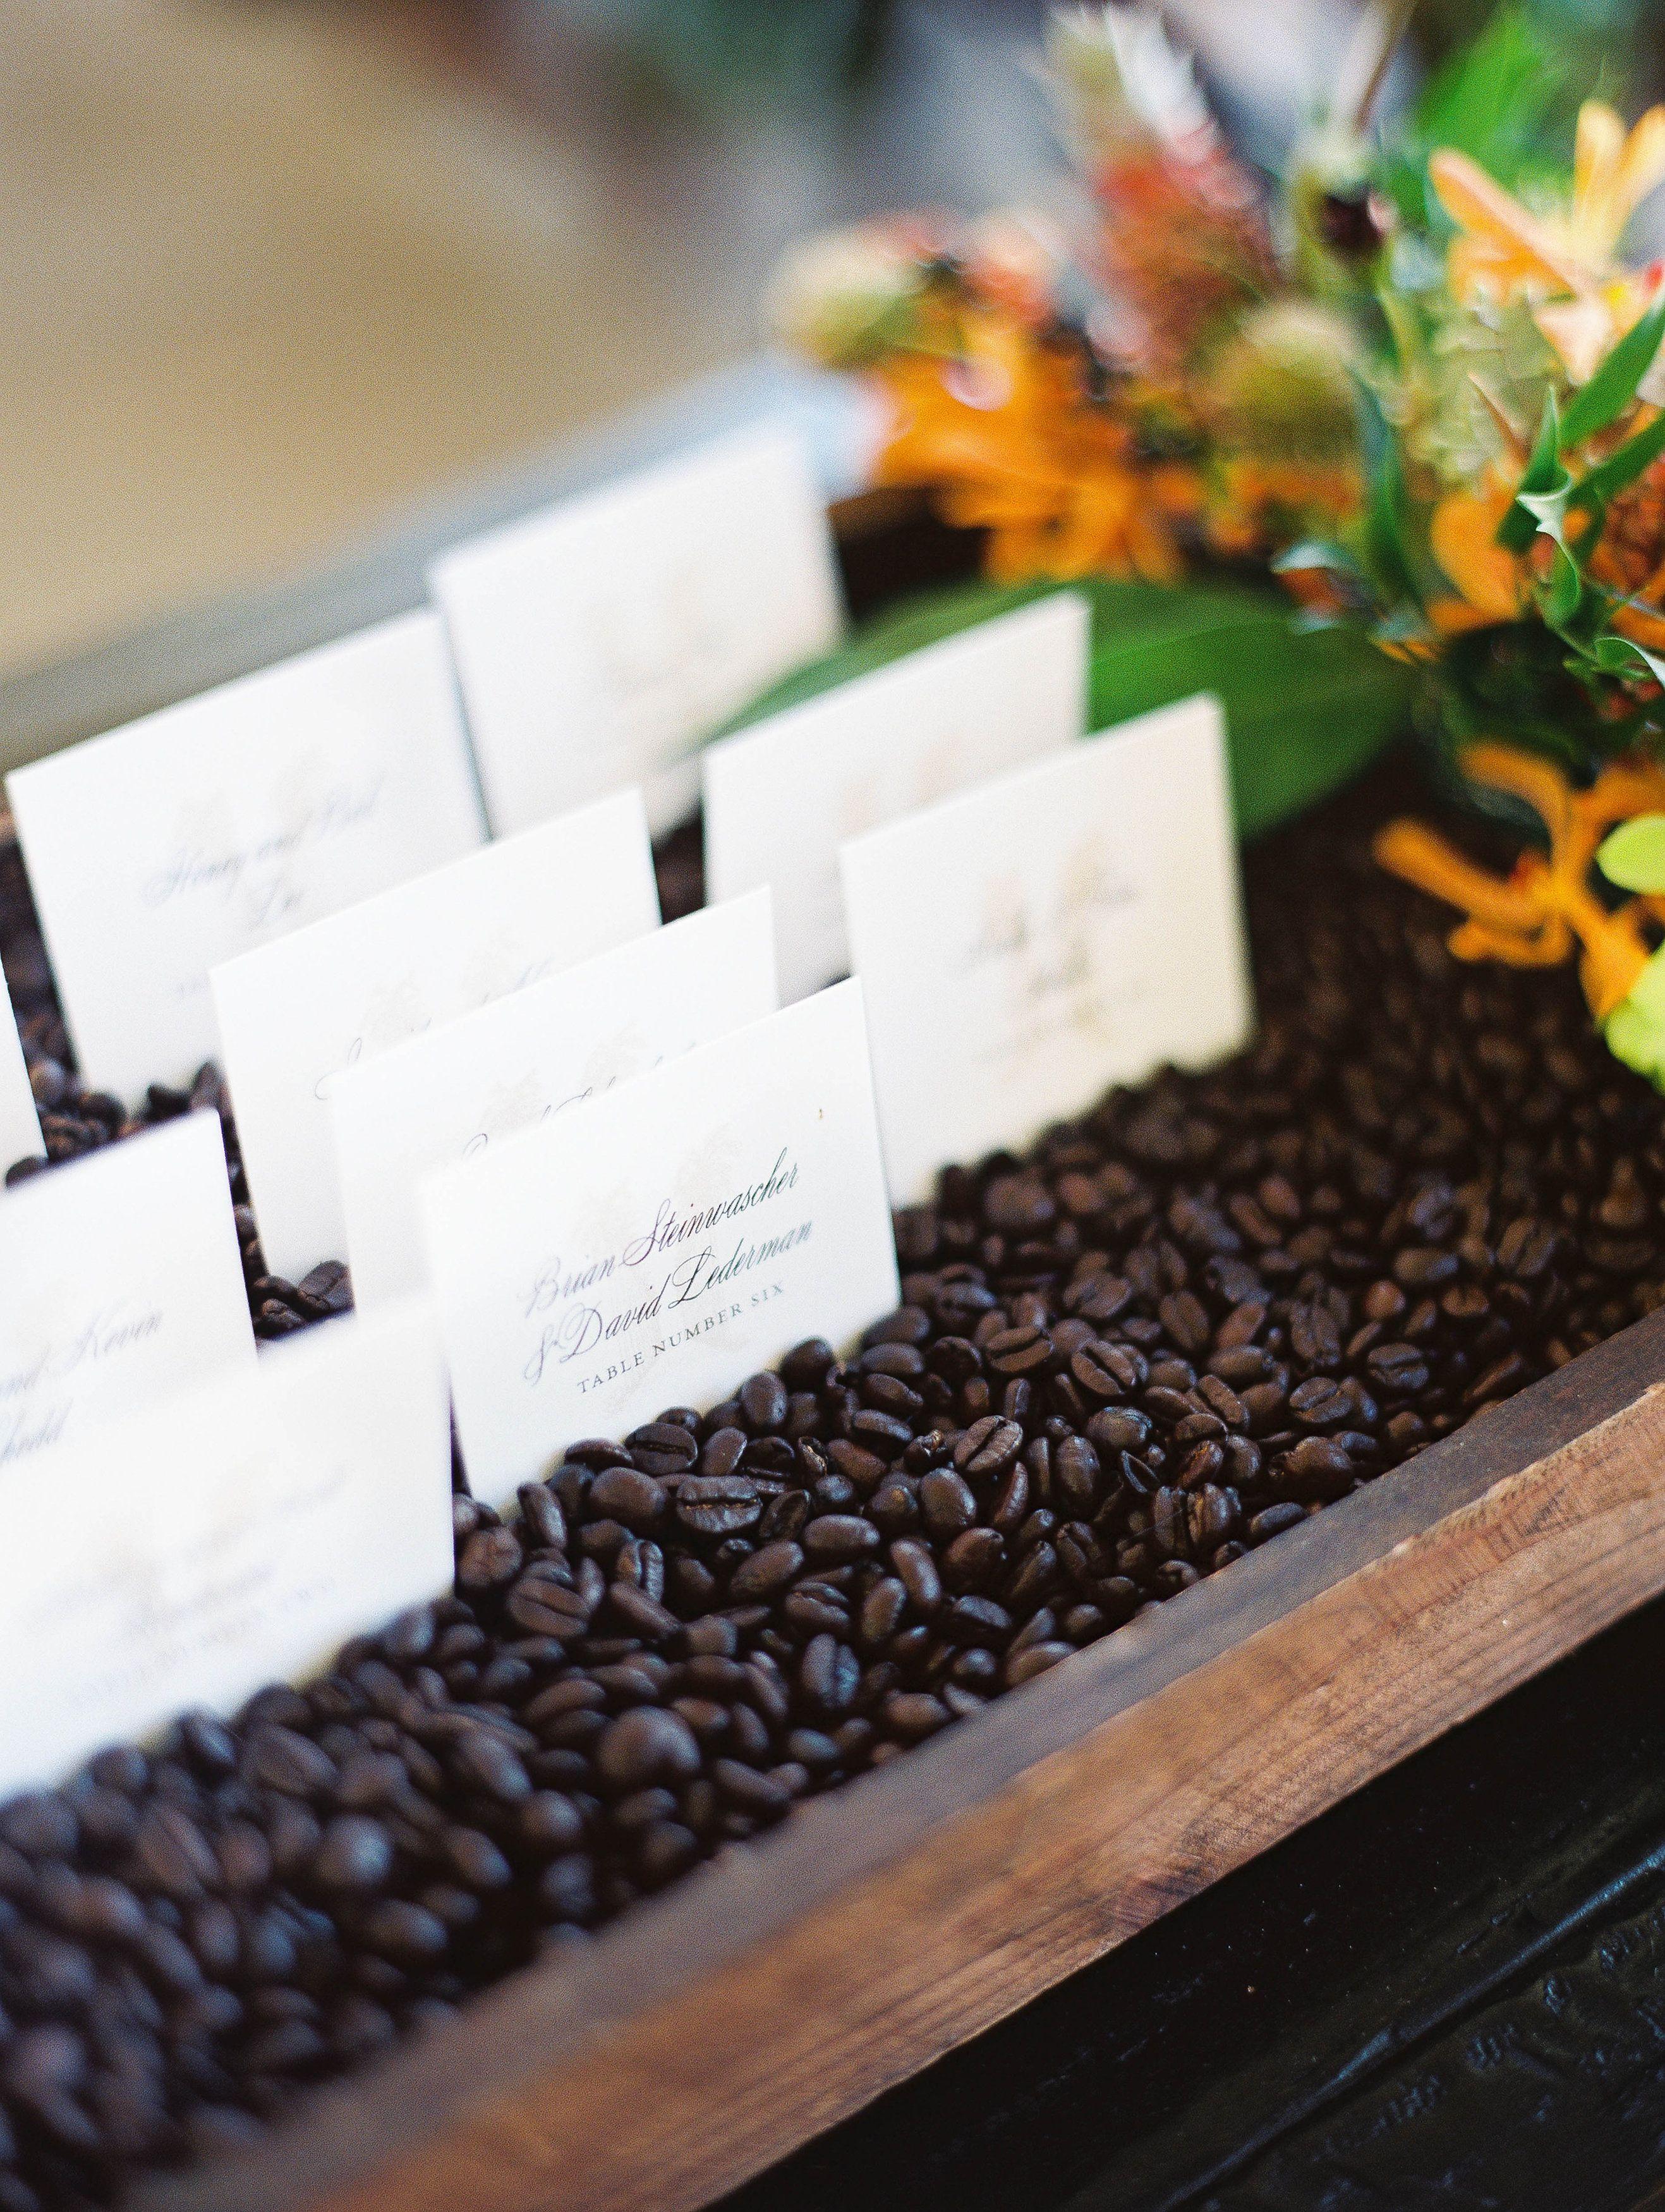 Escort Cards in Coffee Bean Display | Wedding Crafting | Pinterest ...